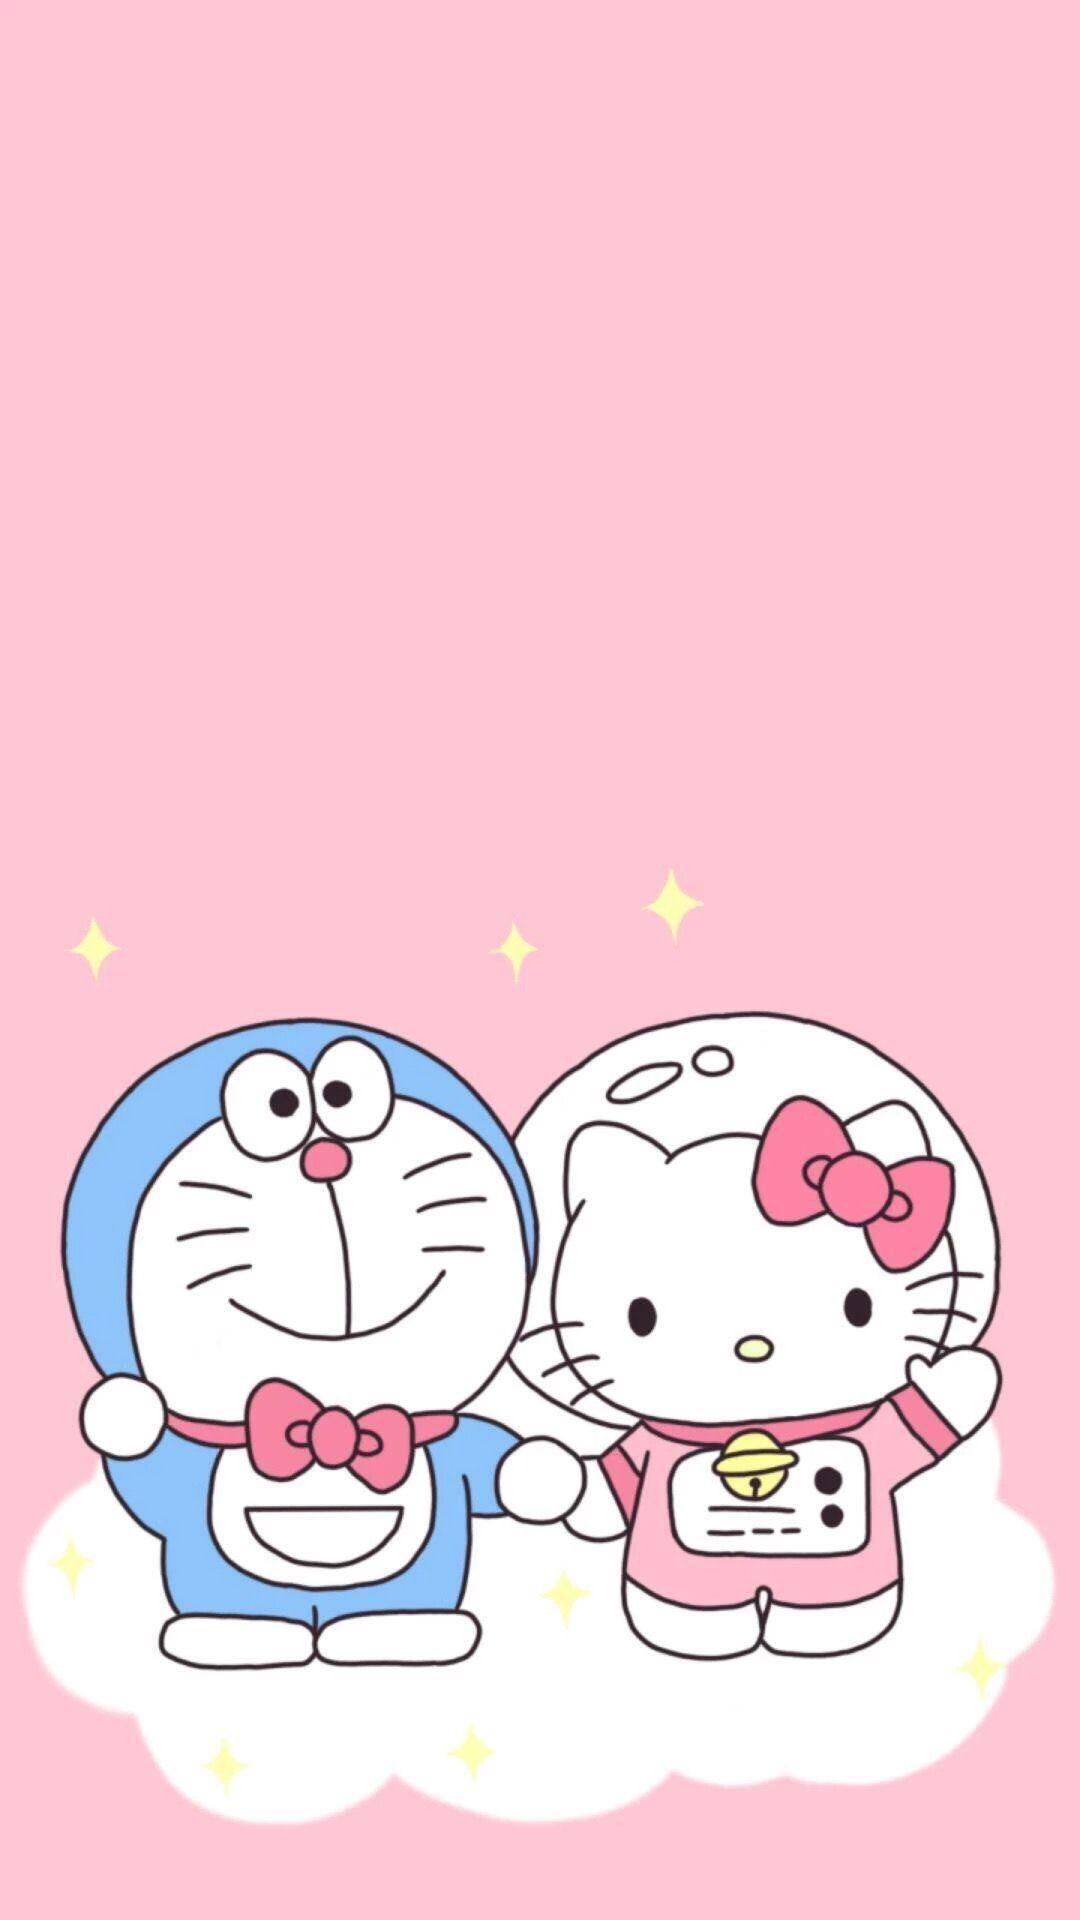 Wallpaper Doraemon Hitam Biru